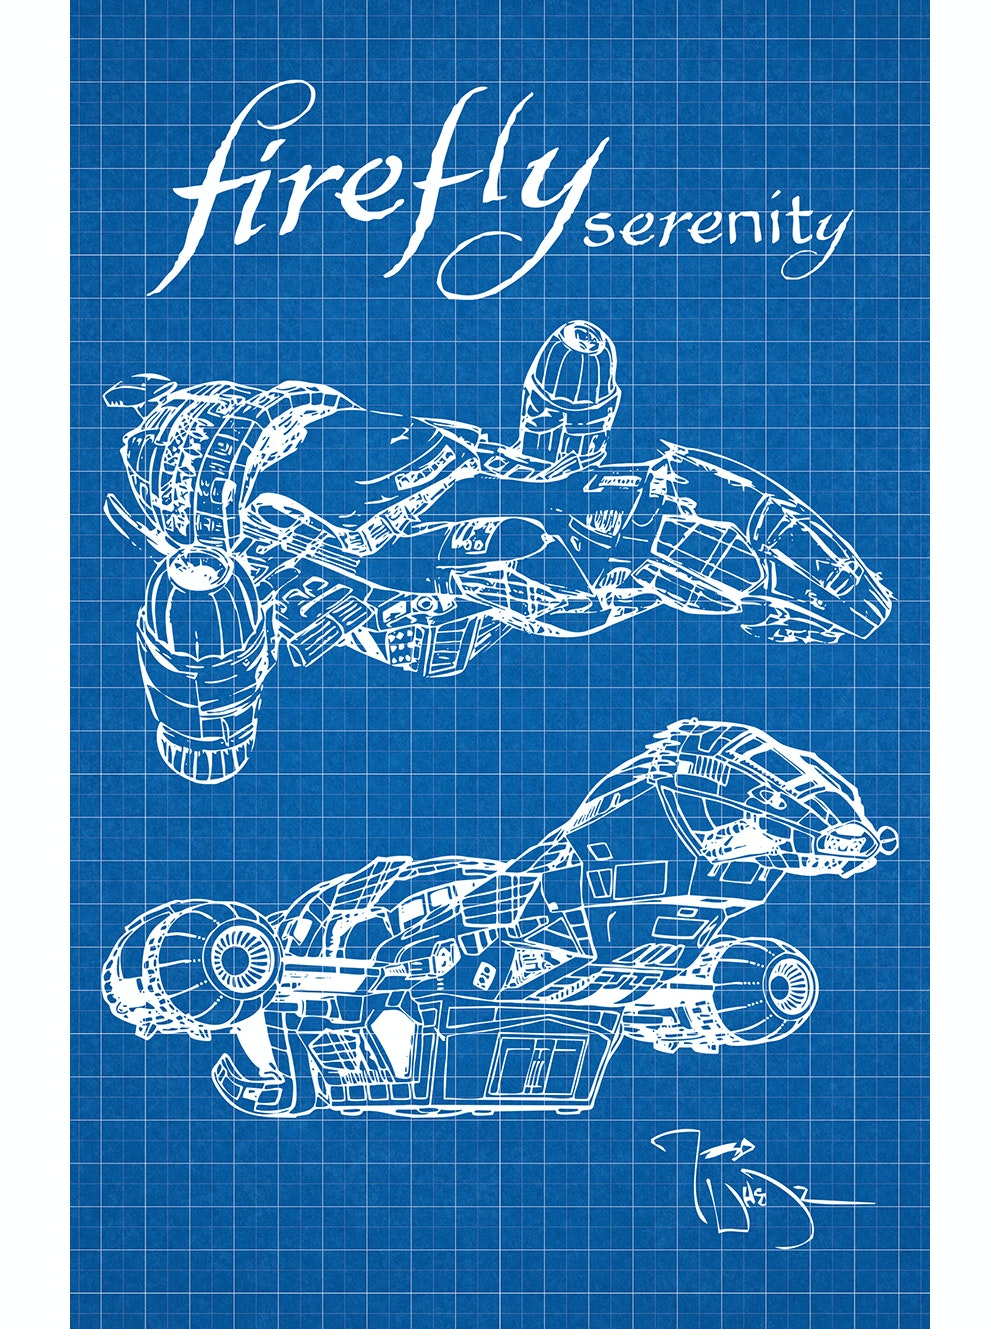 Firefly - Serenity (Vertical Print)